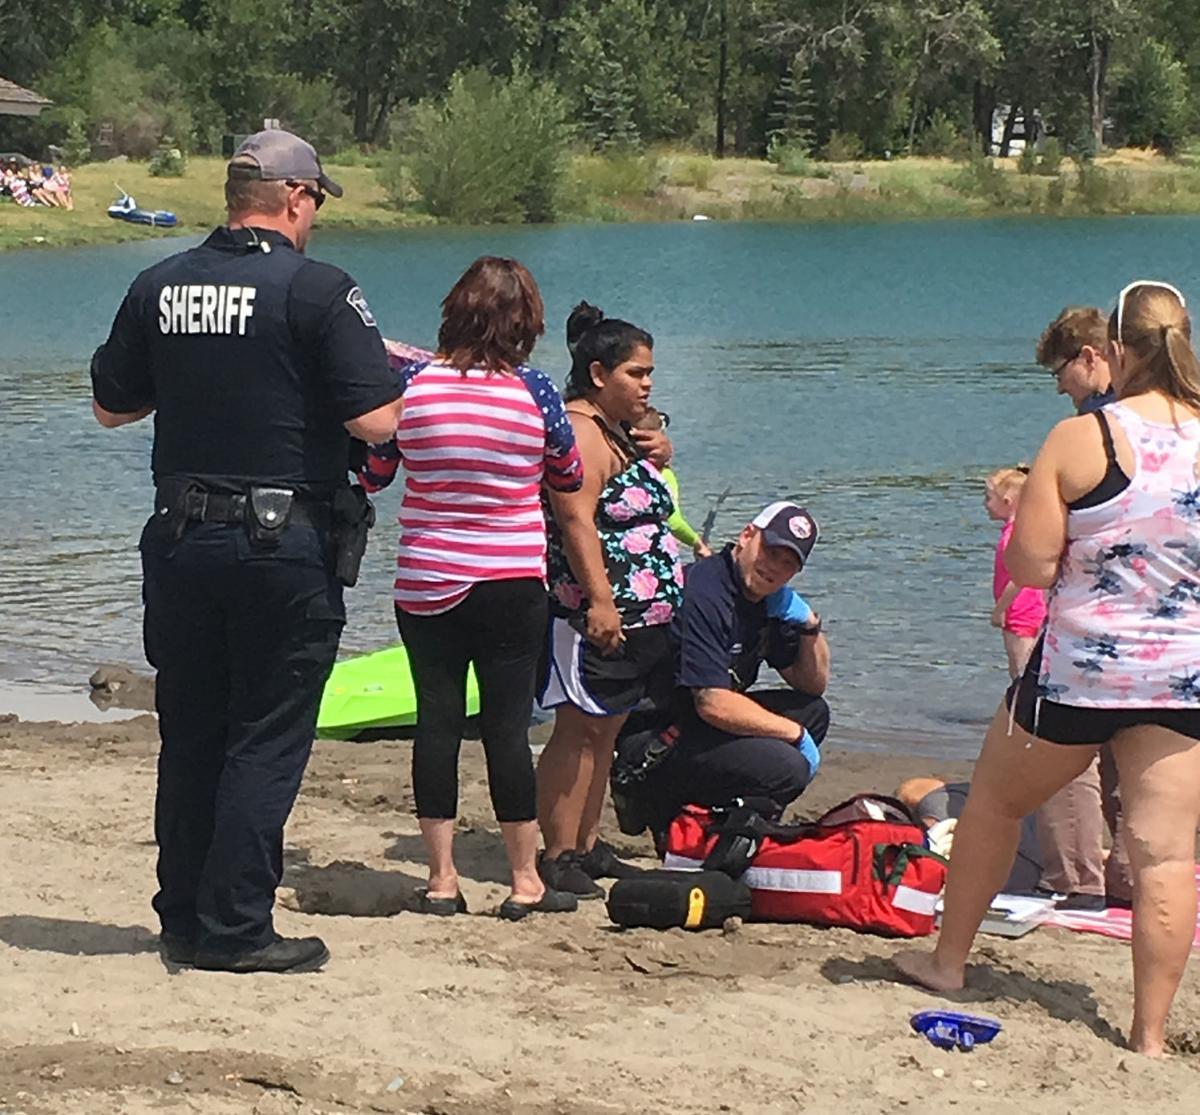 Man saved by 16-year-old at Jefferson Lake